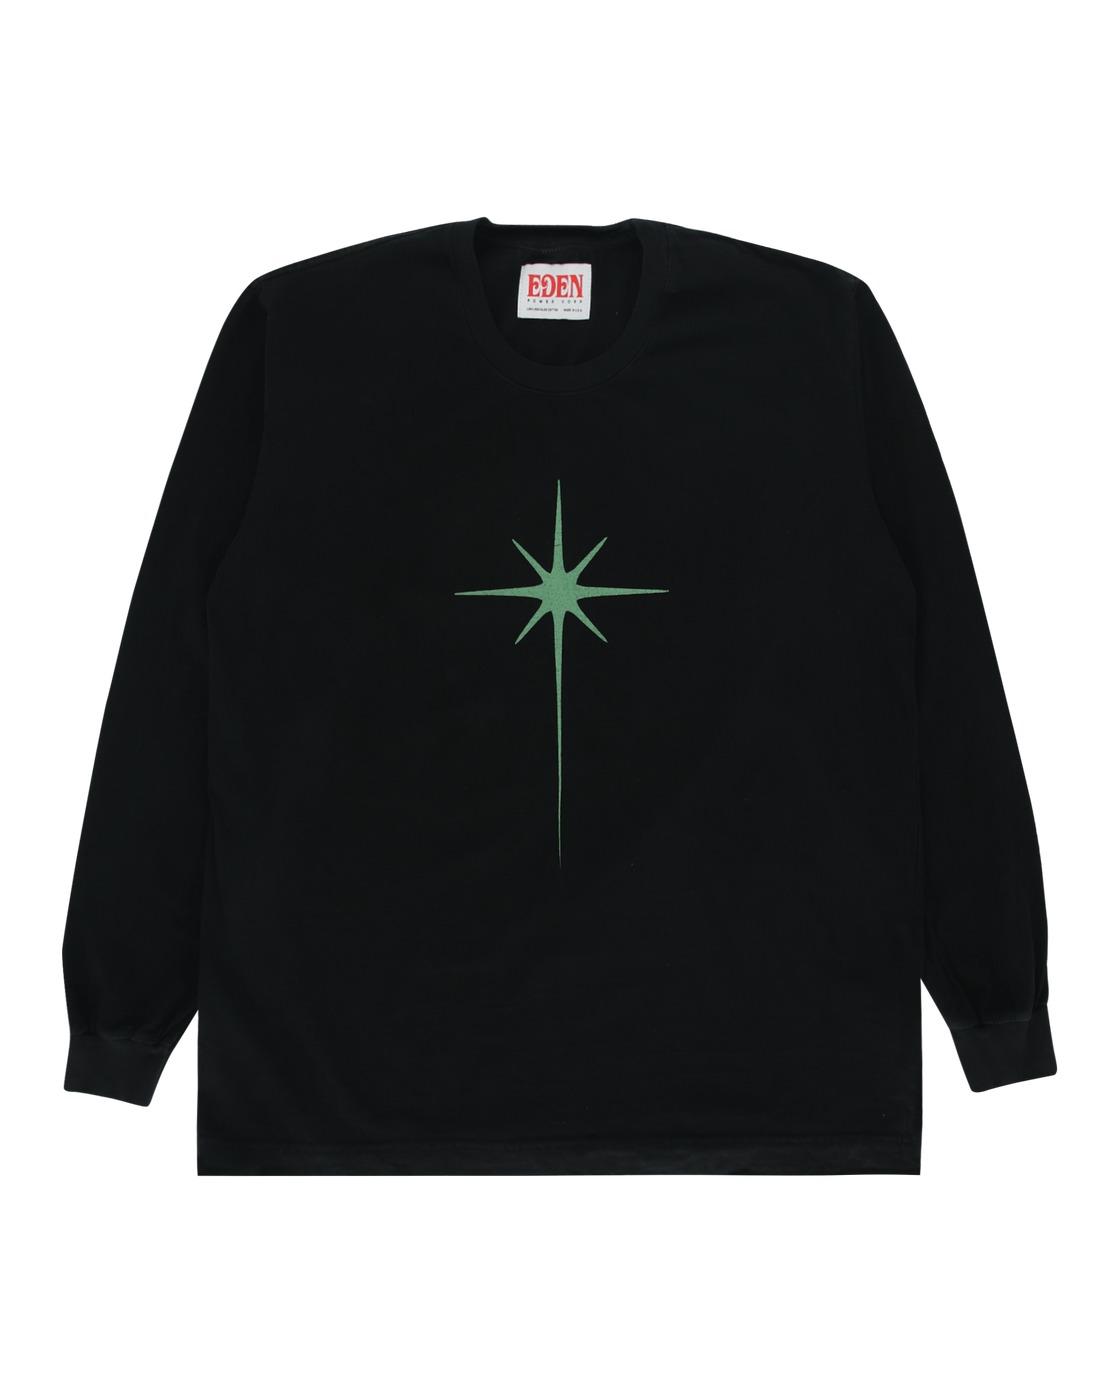 Eden Power Corp Shining Star Recycled Longsleeve T Shirt Black